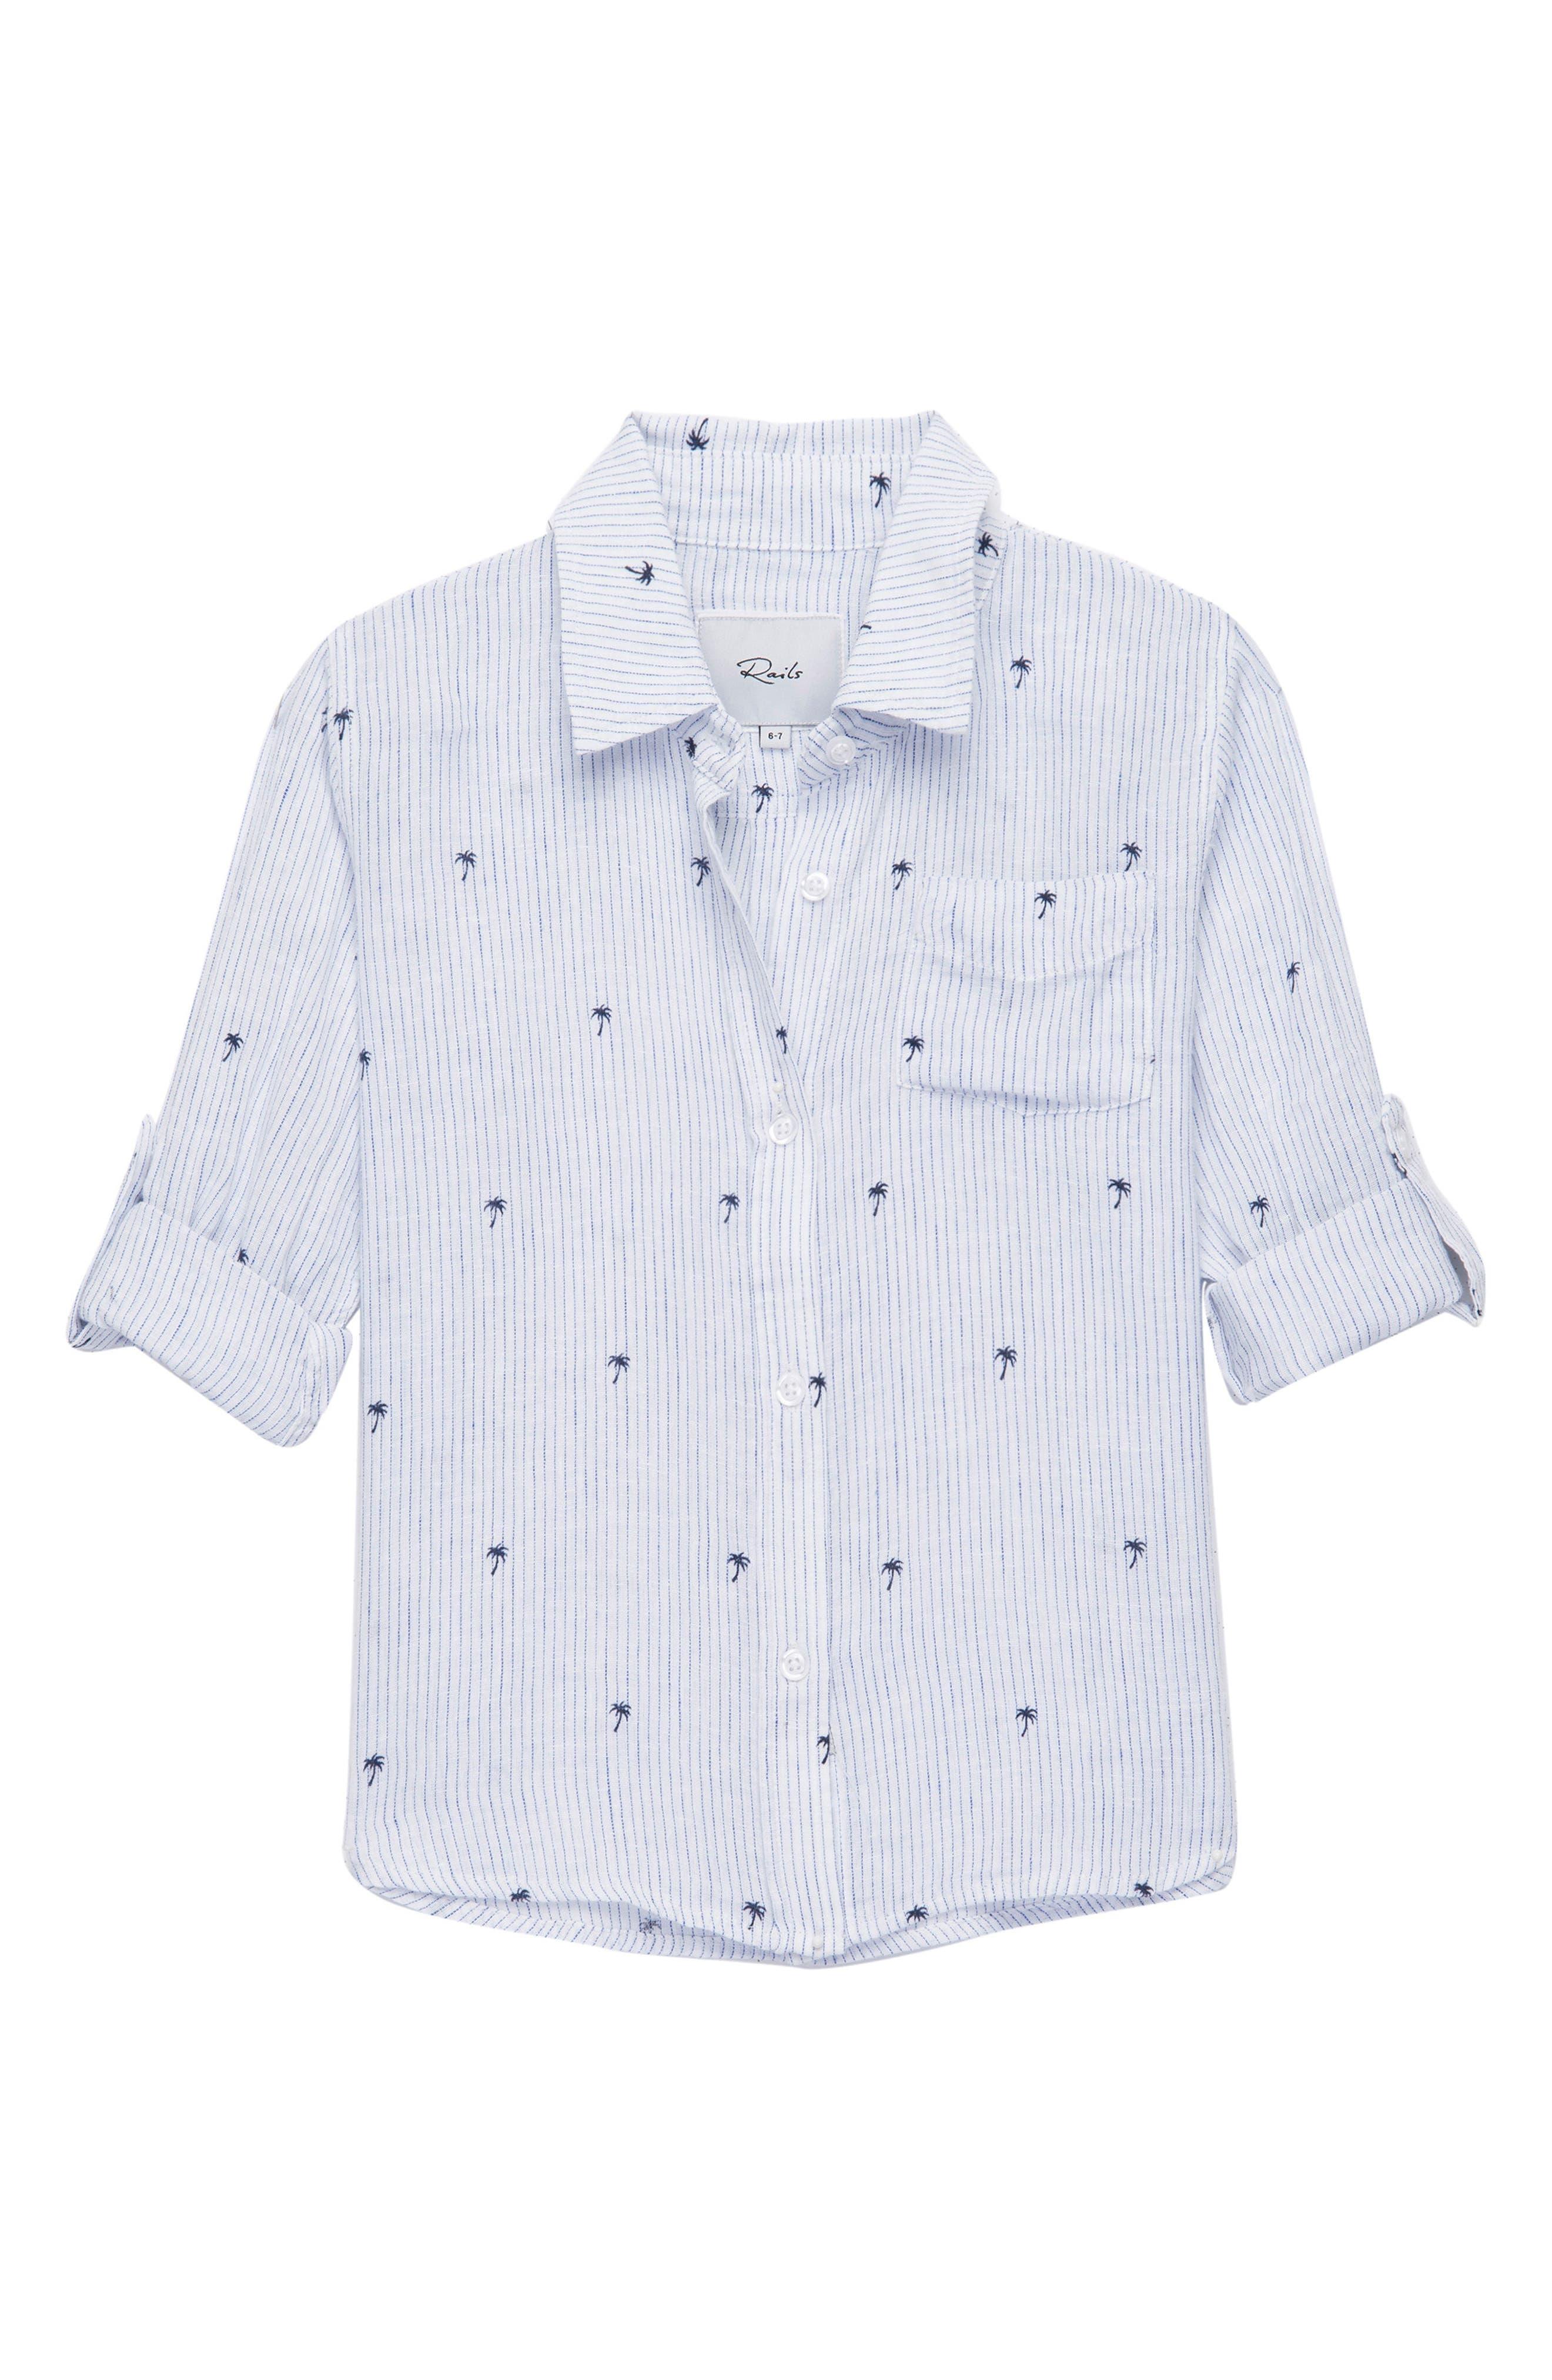 Cora Palm Woven Shirt,                         Main,                         color, Mini Palms On Royal Stripe